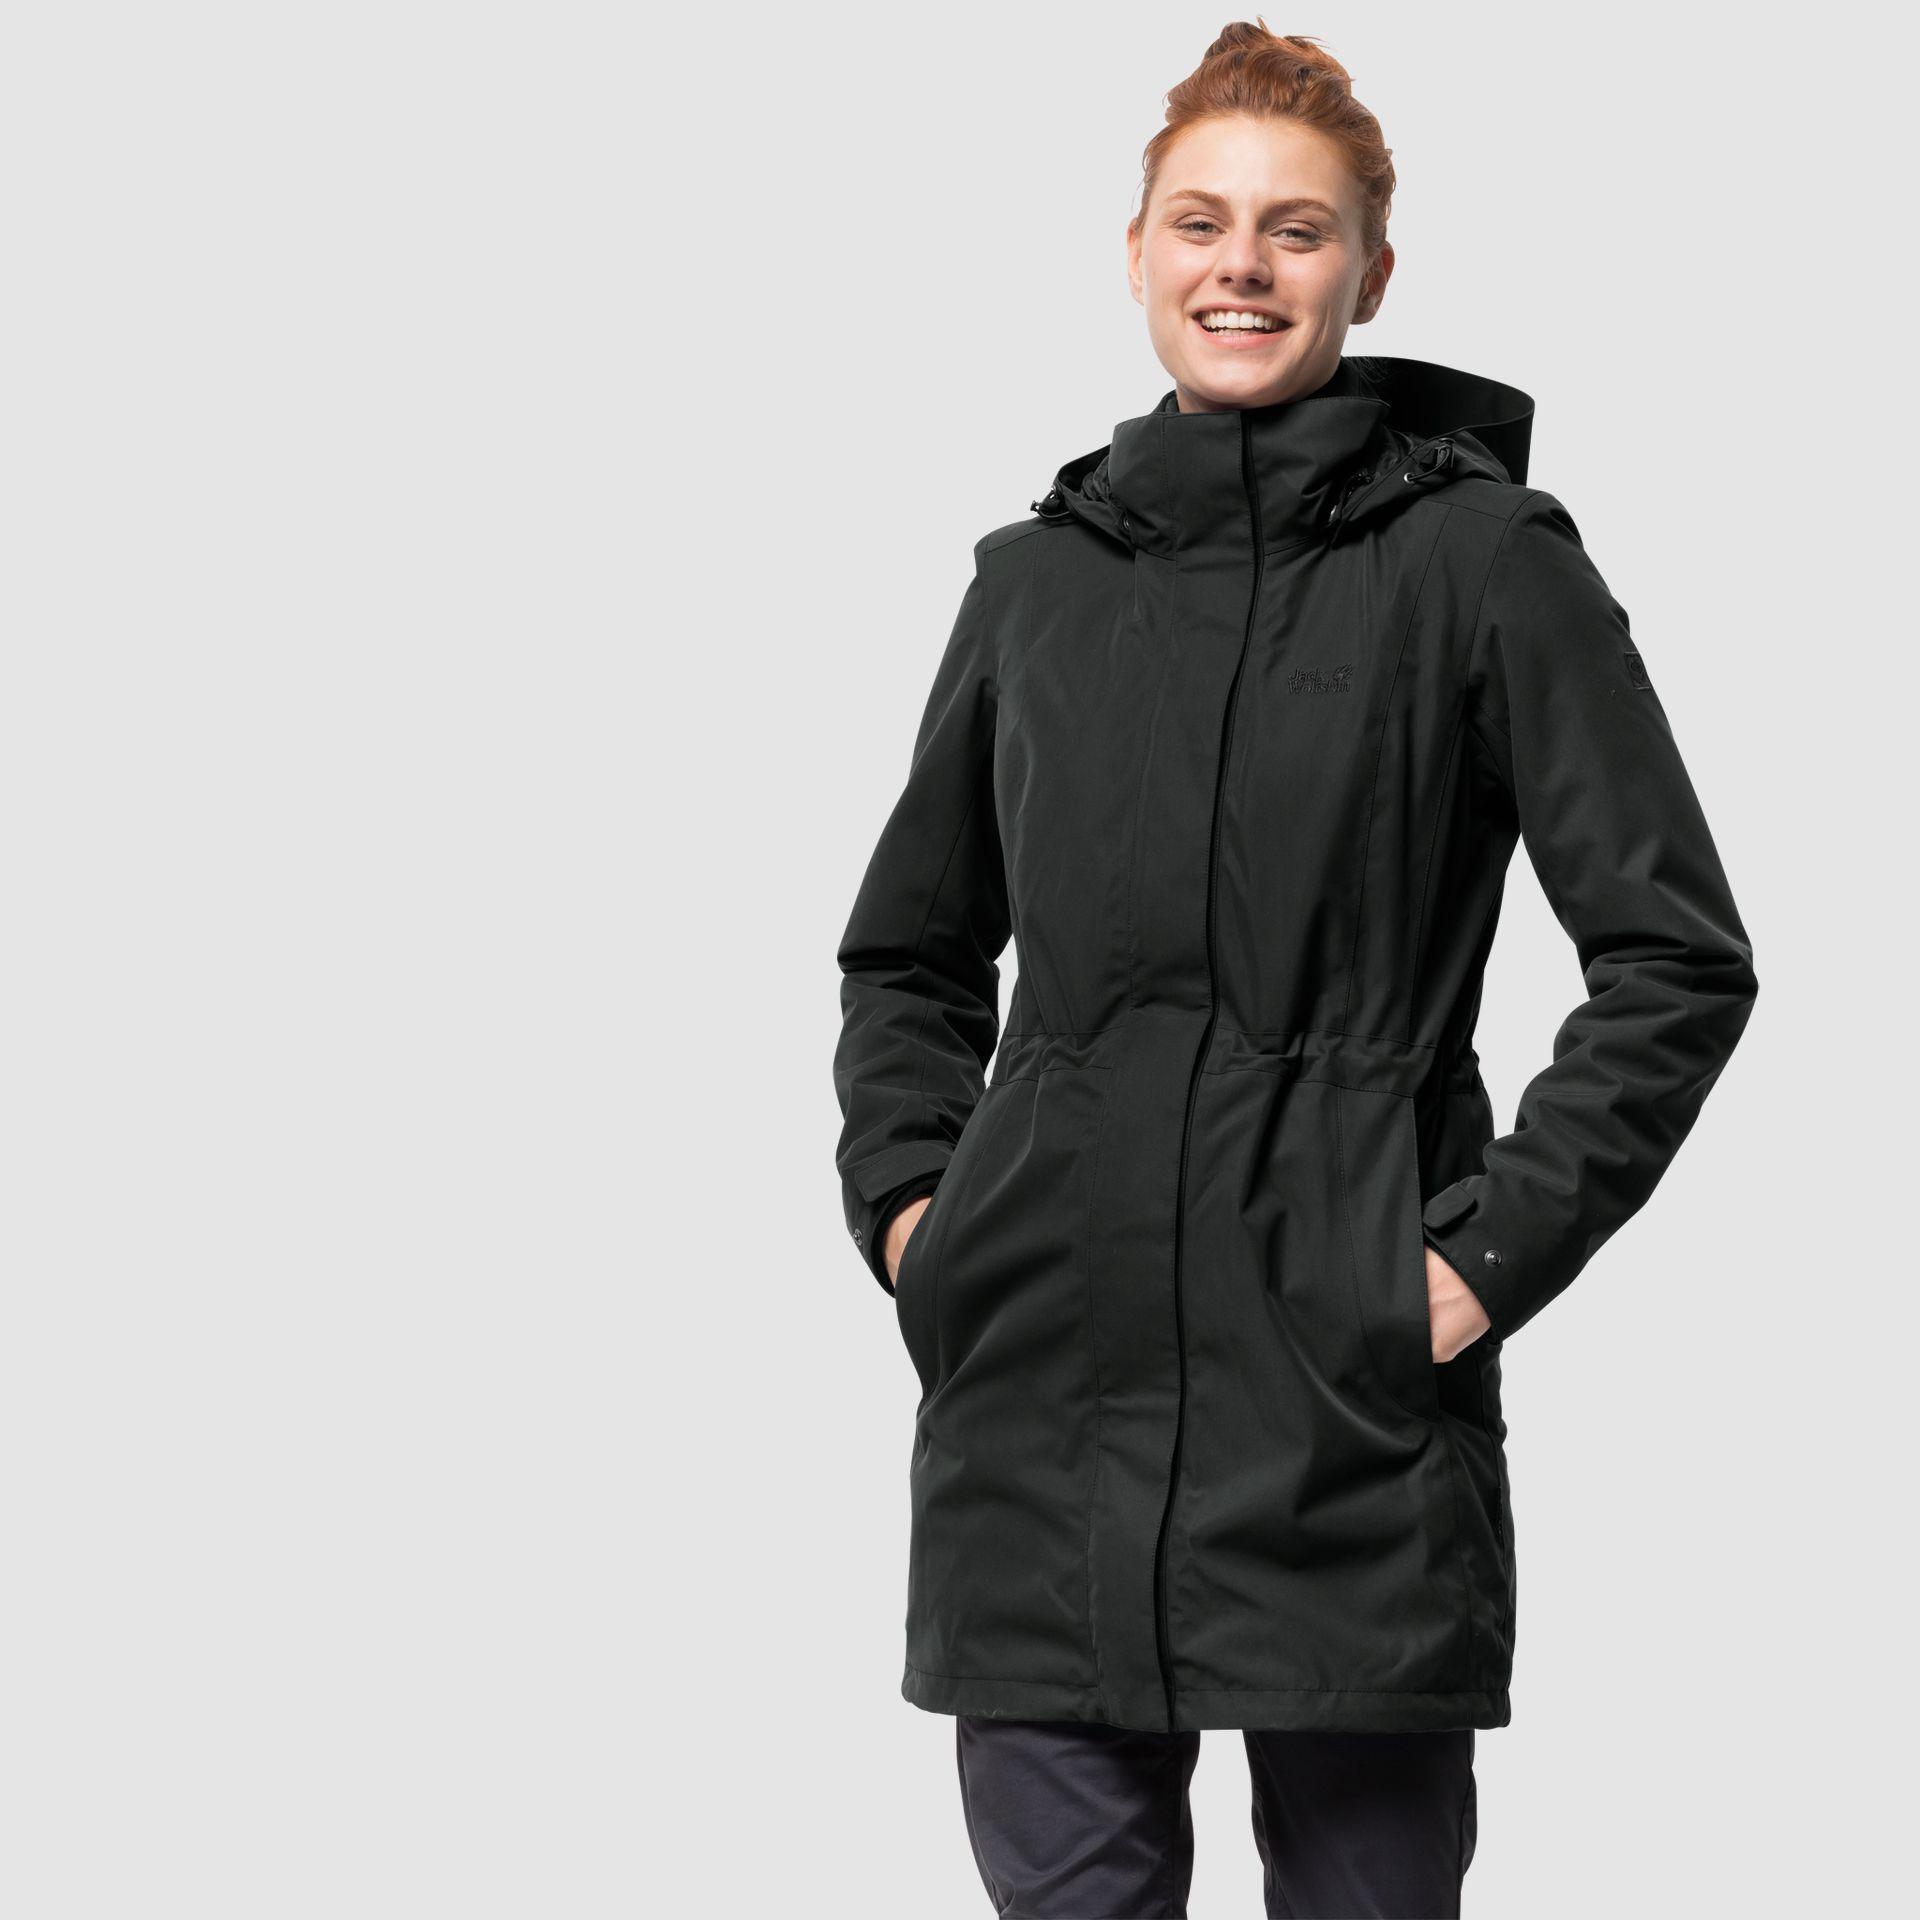 Ottawa Coat Coat Jack Wolfskin Capsule Wardrobe